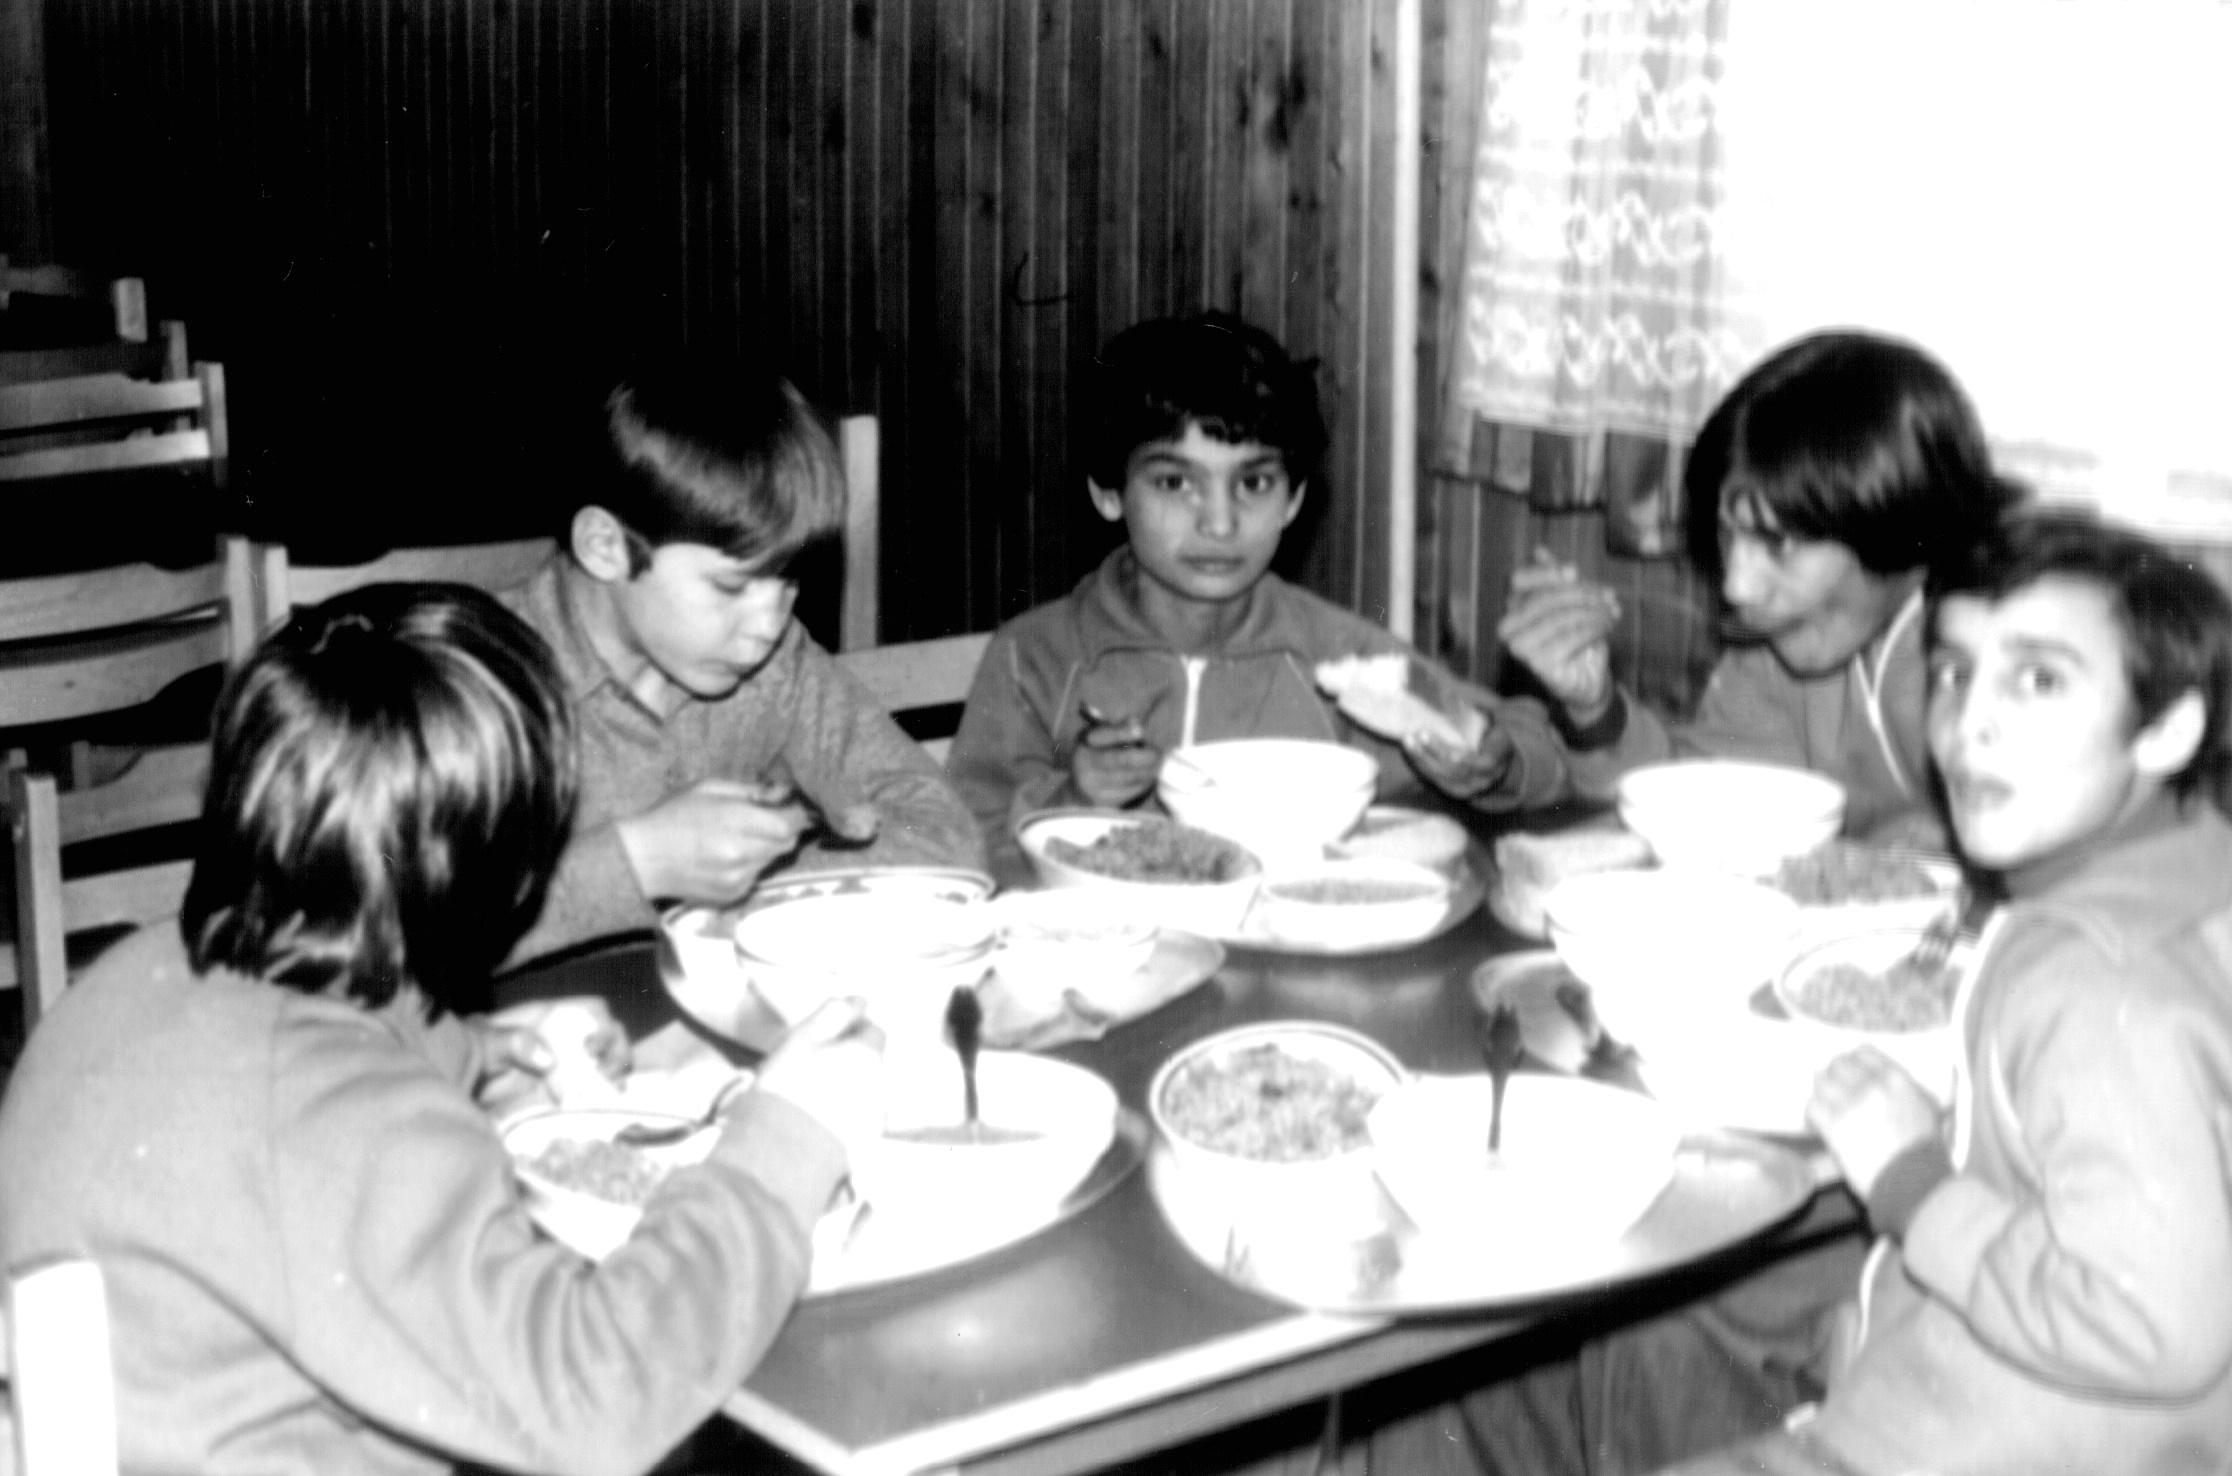 1977-1979_kisterenye_fiuk_2009_06_23_15-05-56_2232x1476_16-05-56_2232x1476.JPG